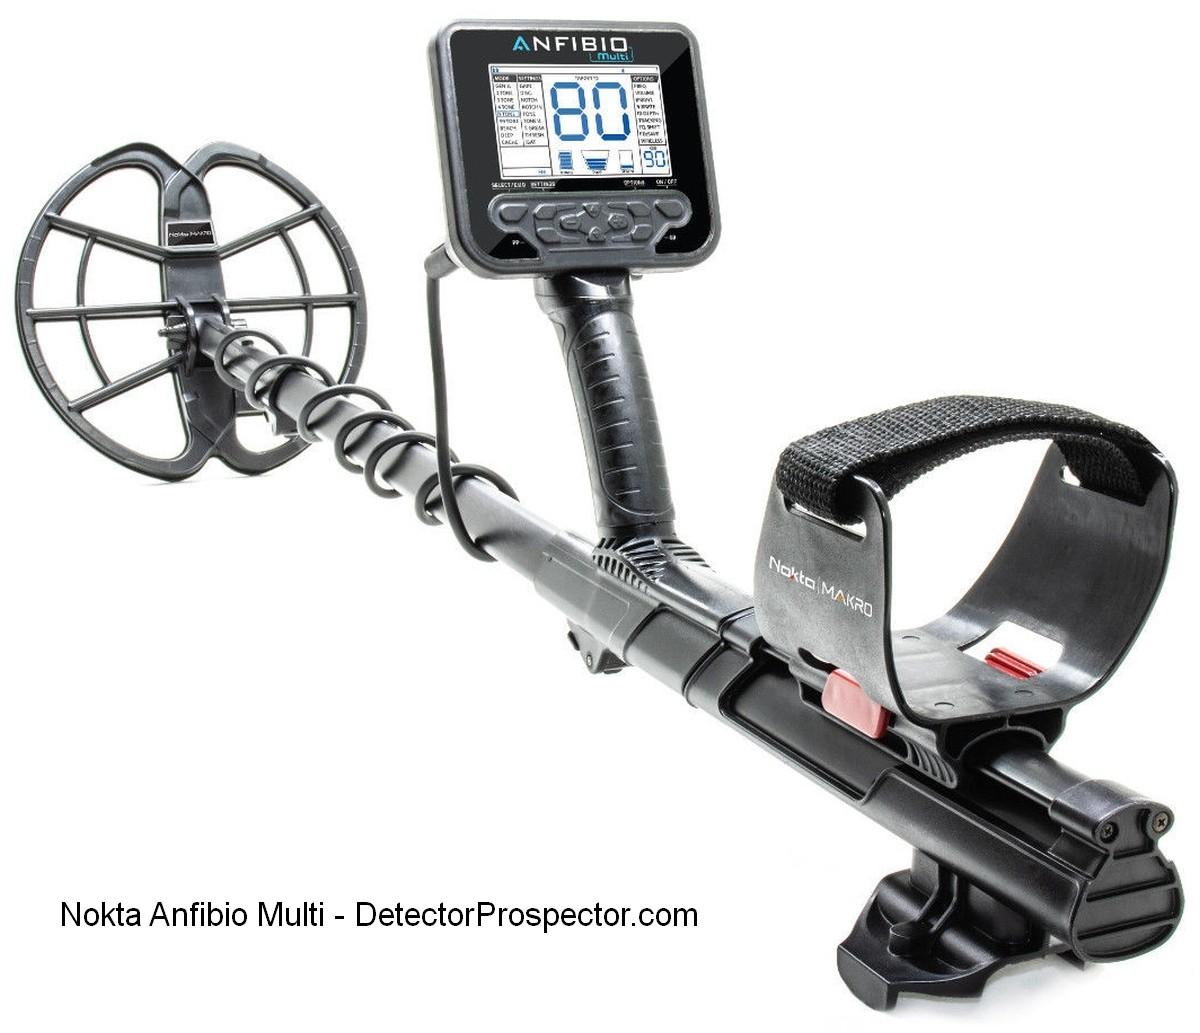 nokta-anfibio-mulrifrequency-waterproof-